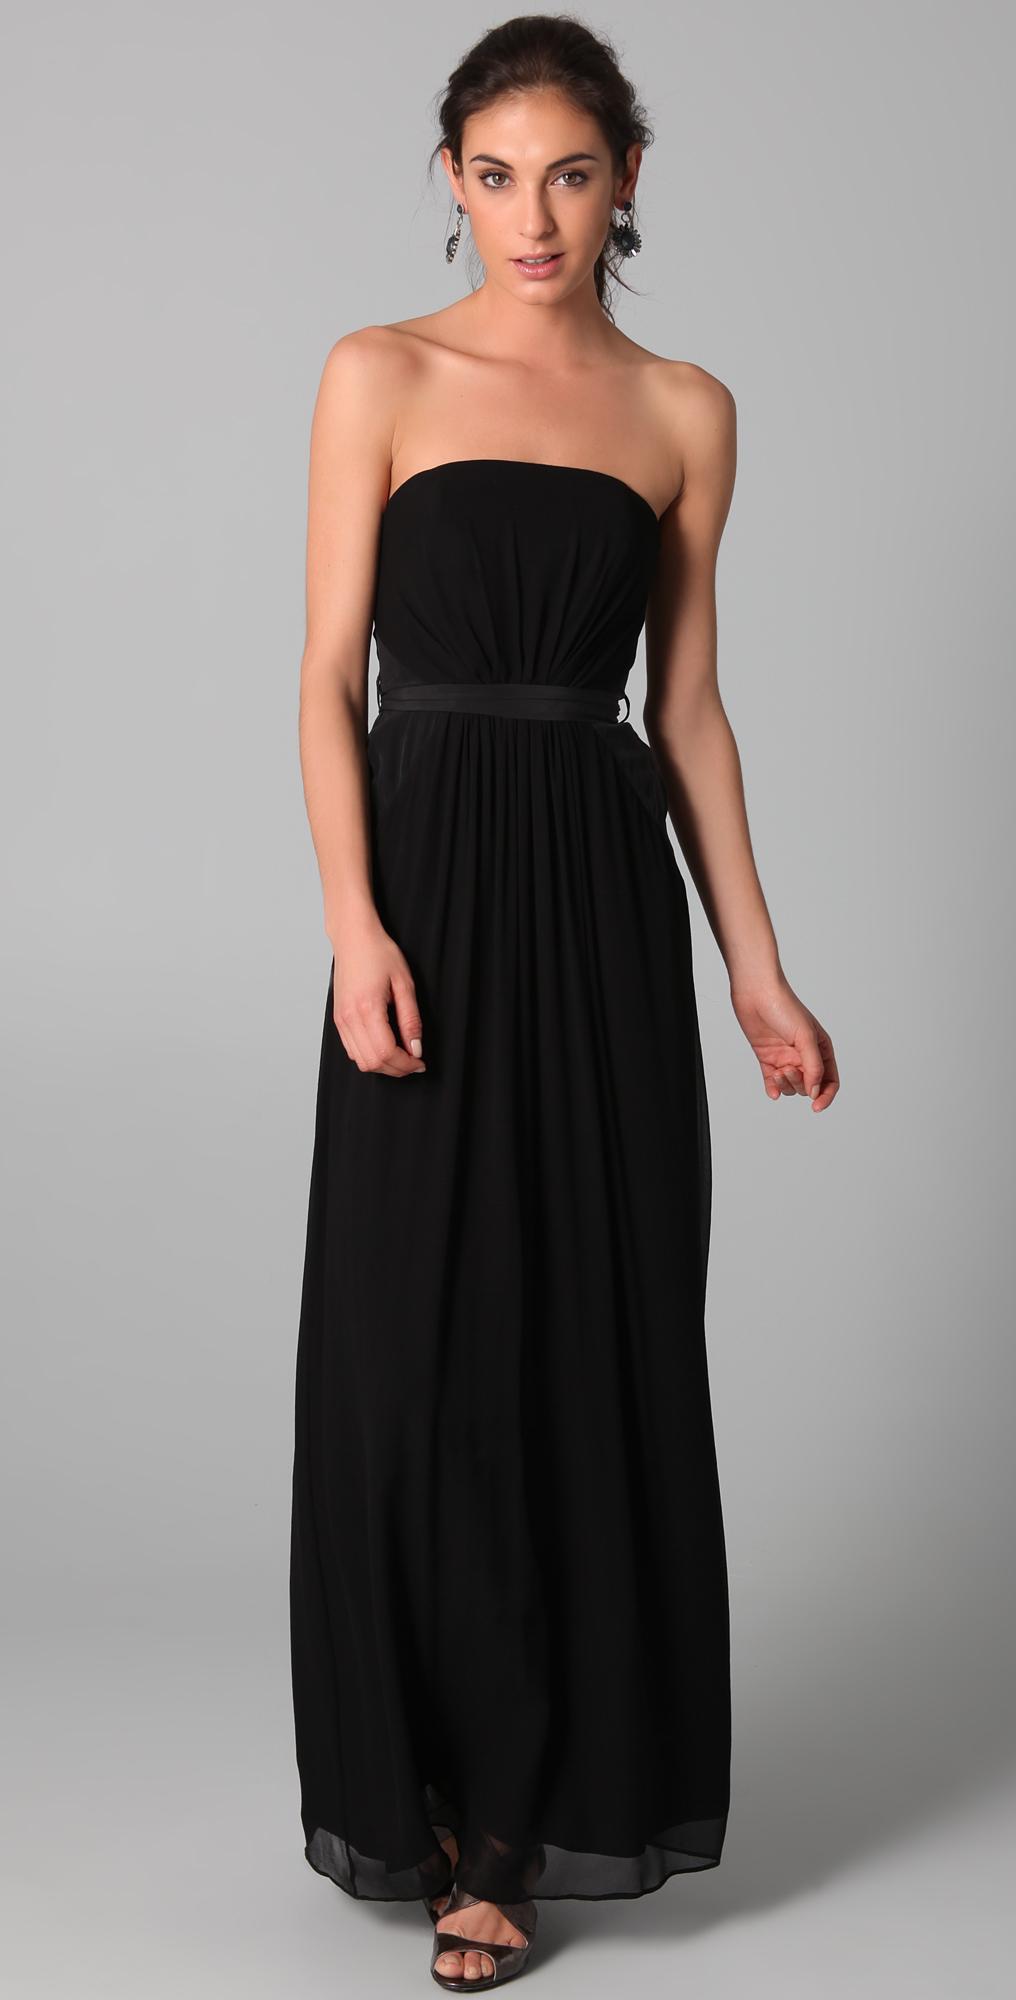 Zimmermann Ruched Strapless Maxi Dress